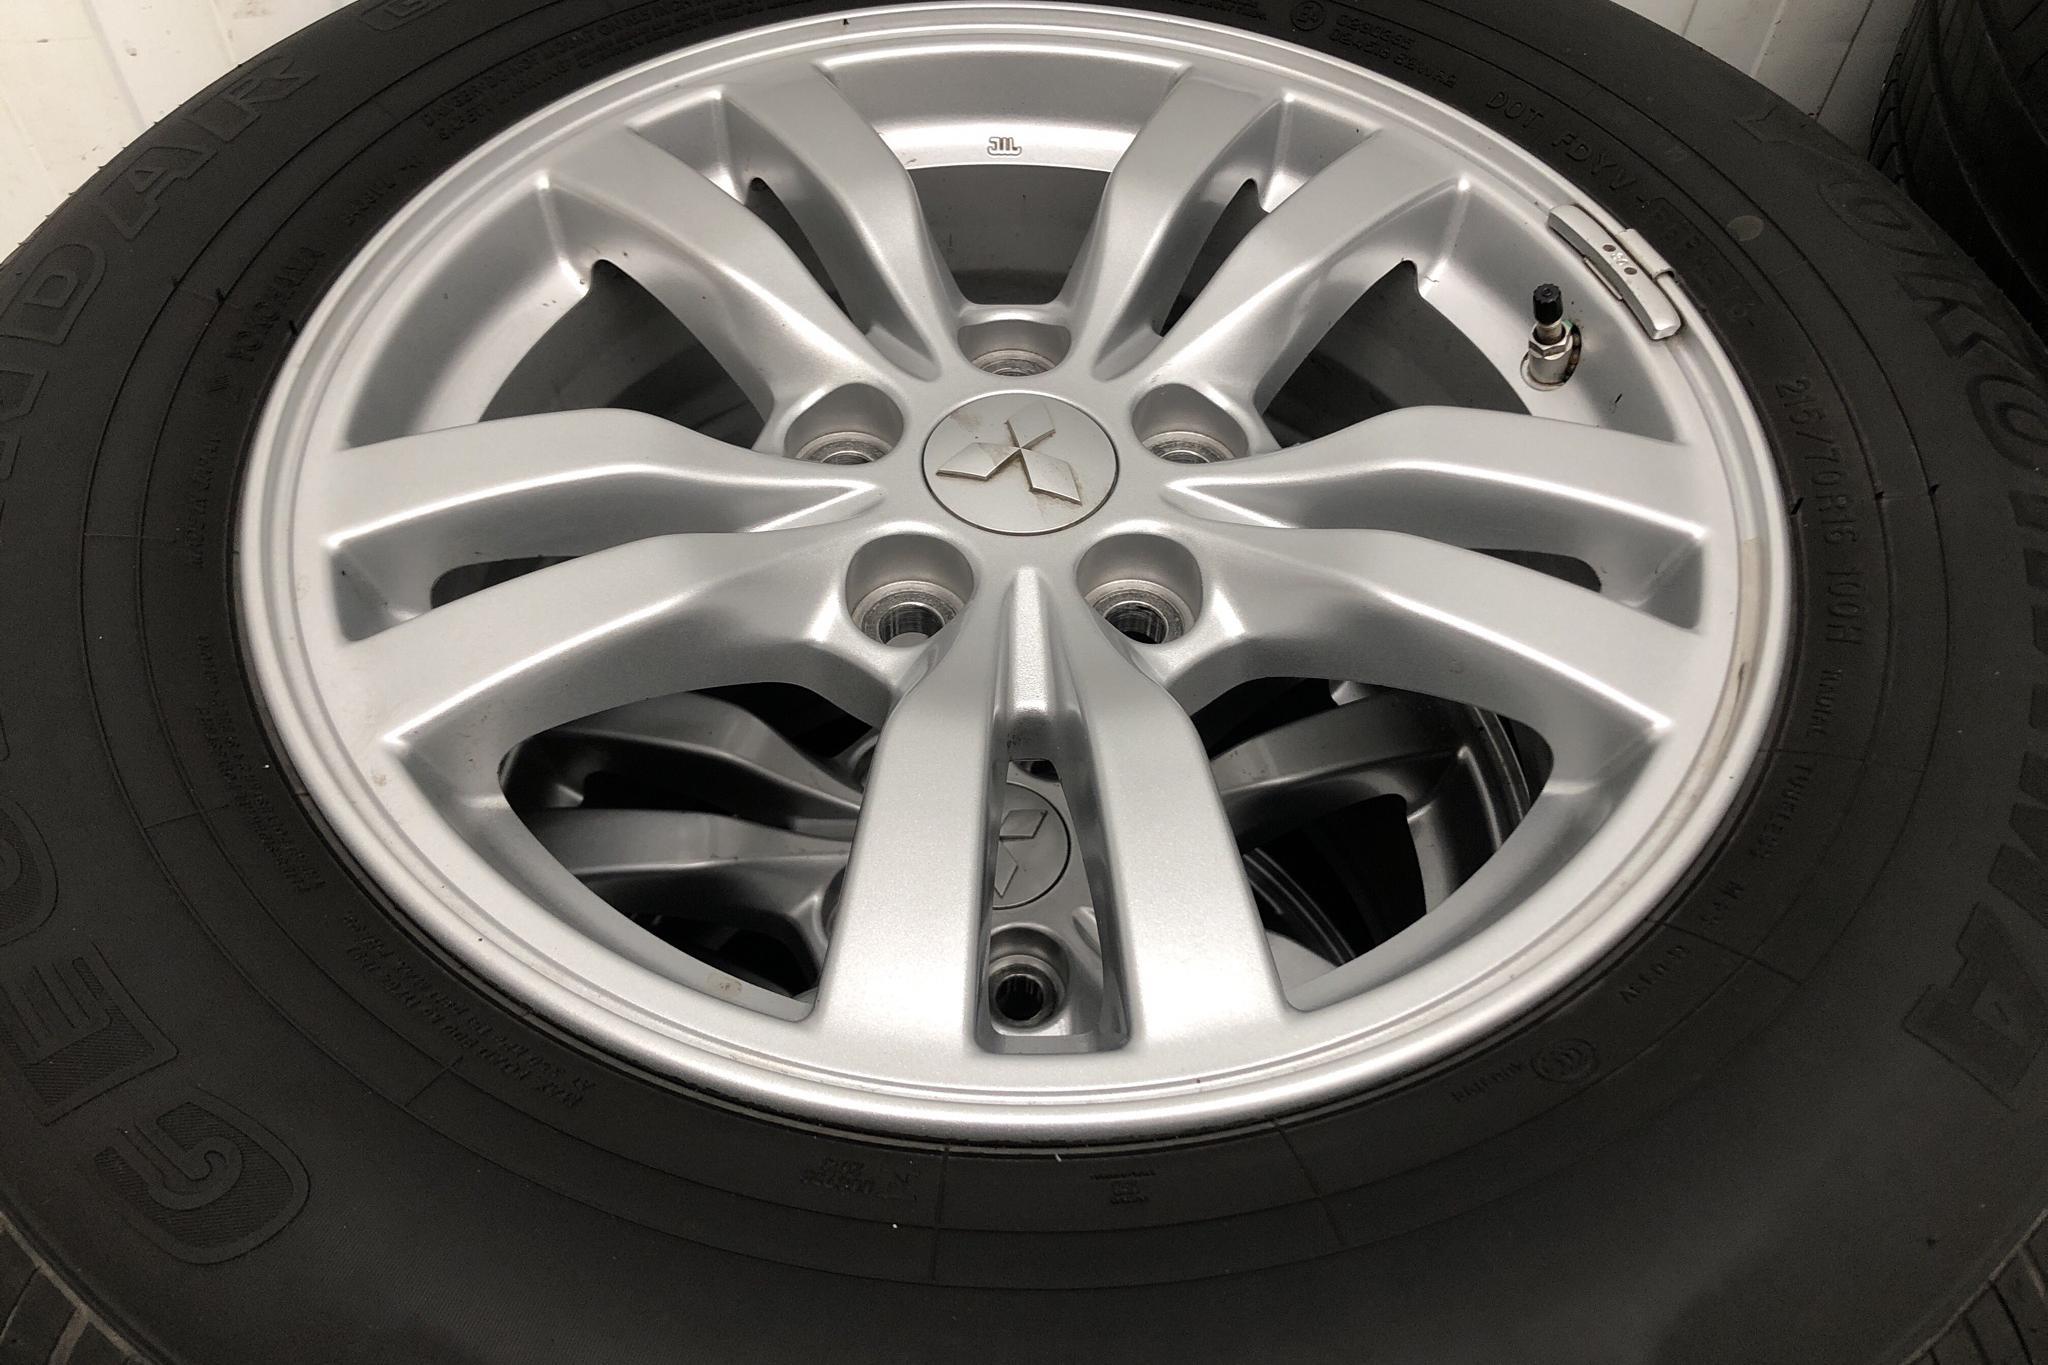 Mitsubishi Outlander 2.0 Plug-in Hybrid 4WD (121hk) - 58 470 km - Automatic - white - 2017